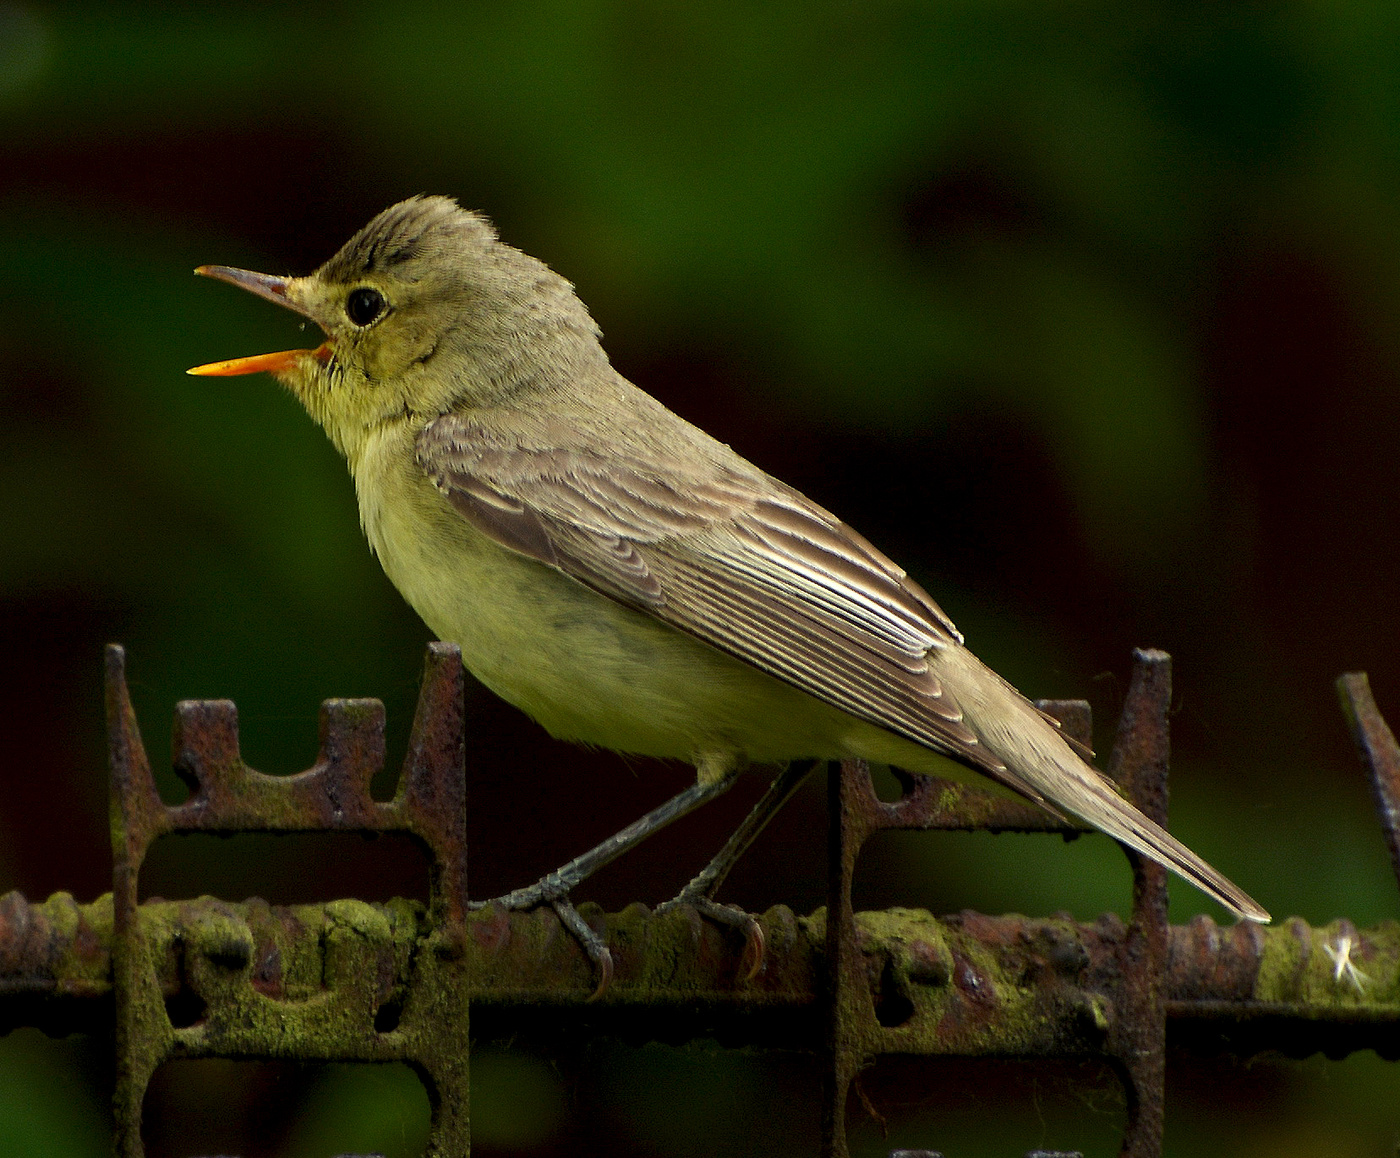 птицы фото зеленая пересмешка